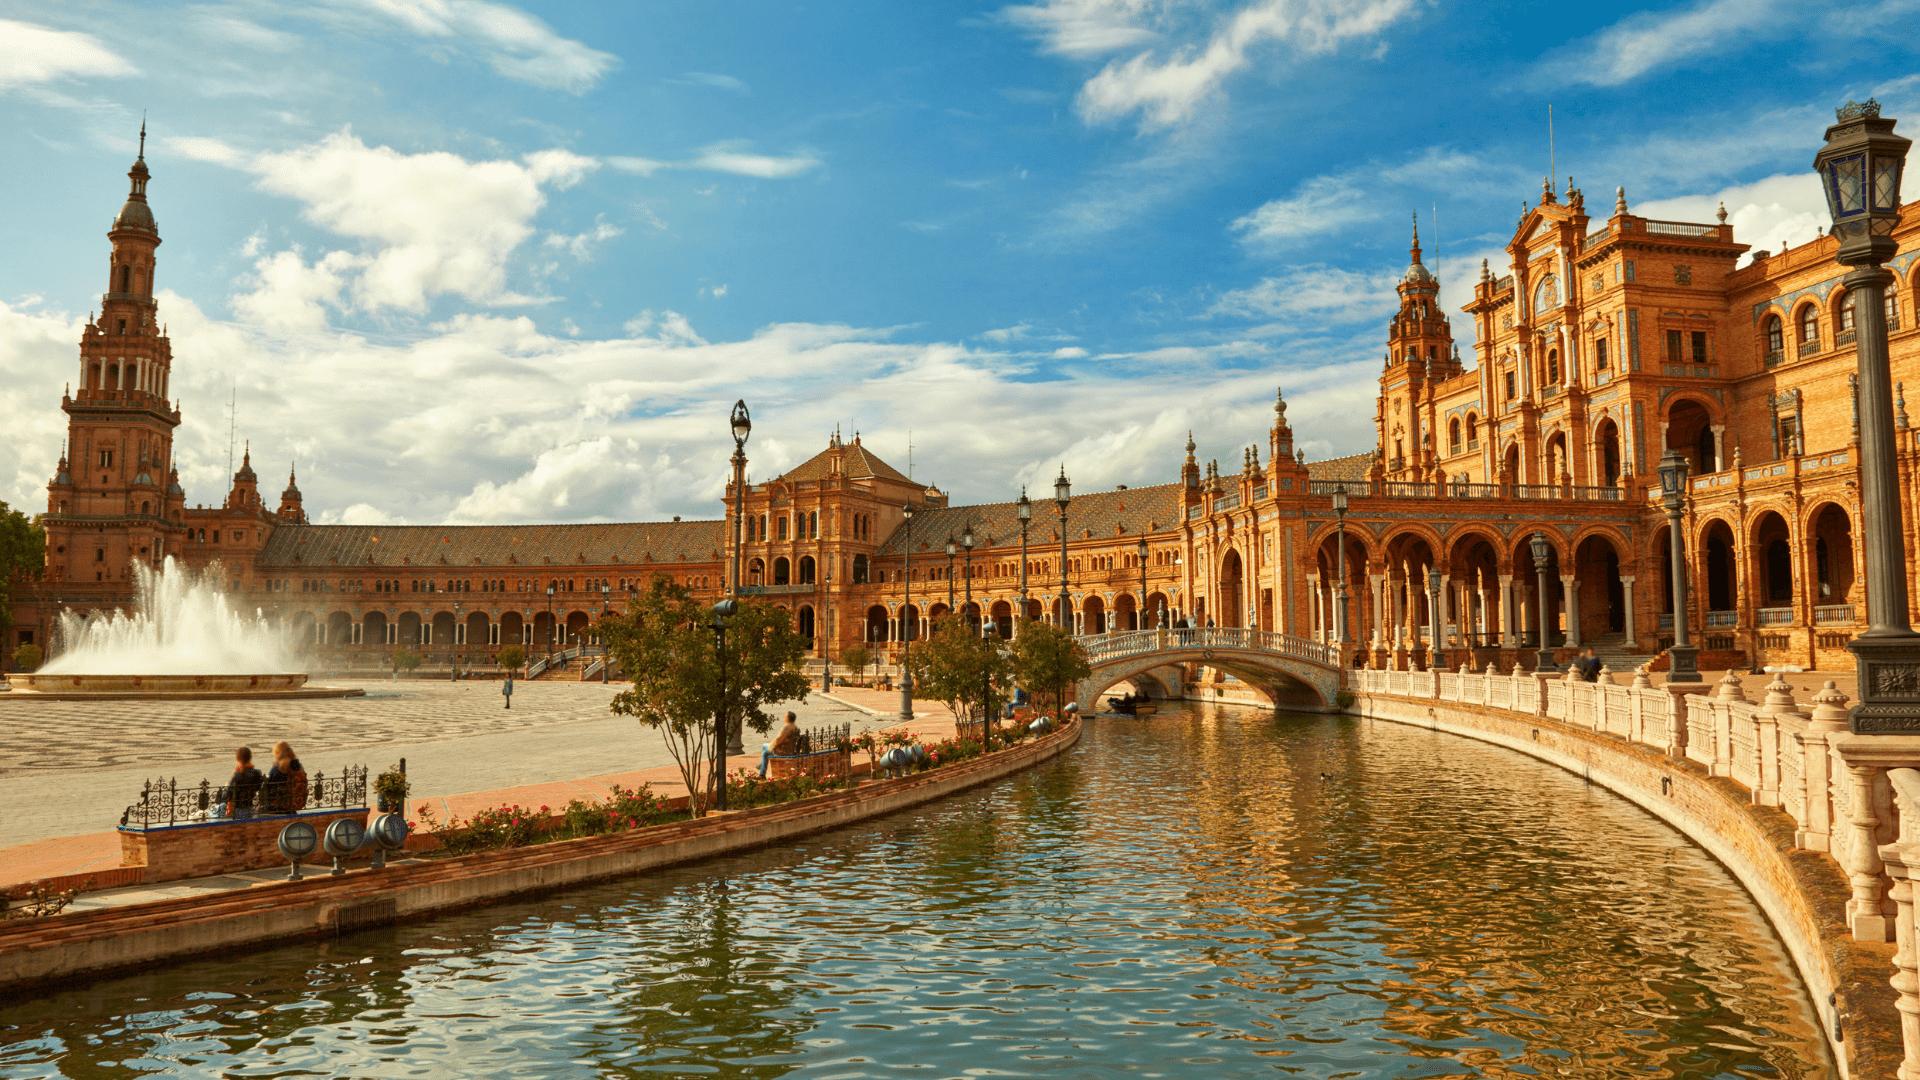 Įspūdingoji Plaza de Espana